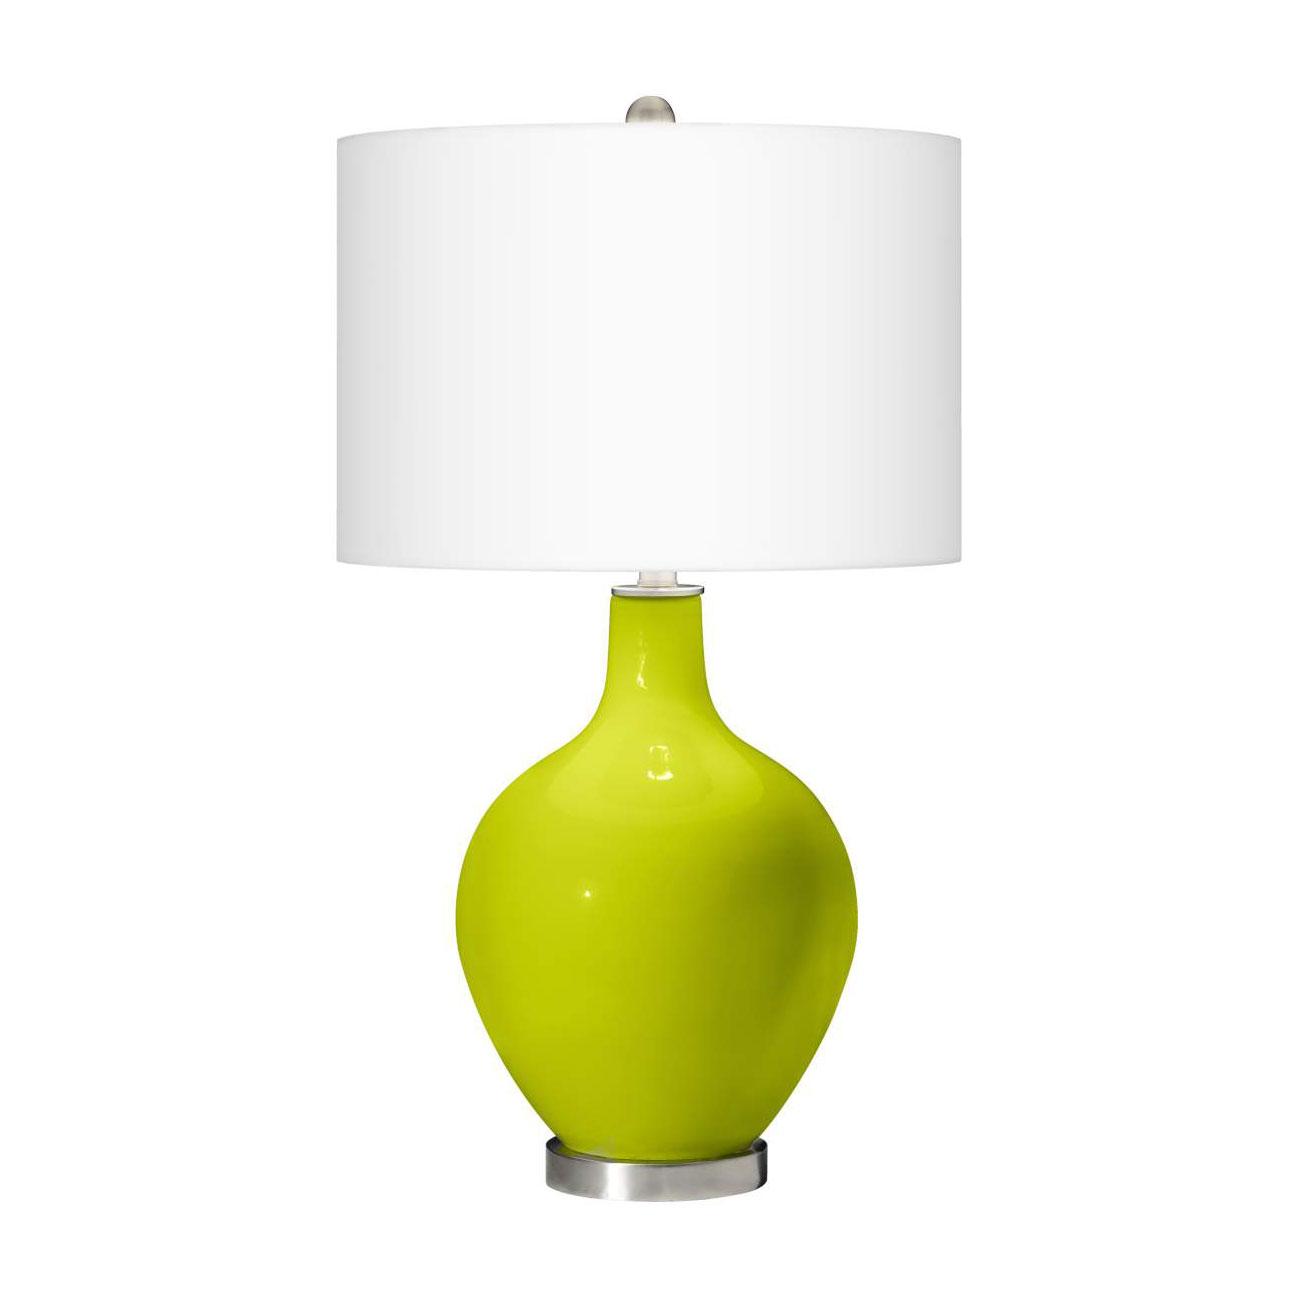 apple lamp photo - 4